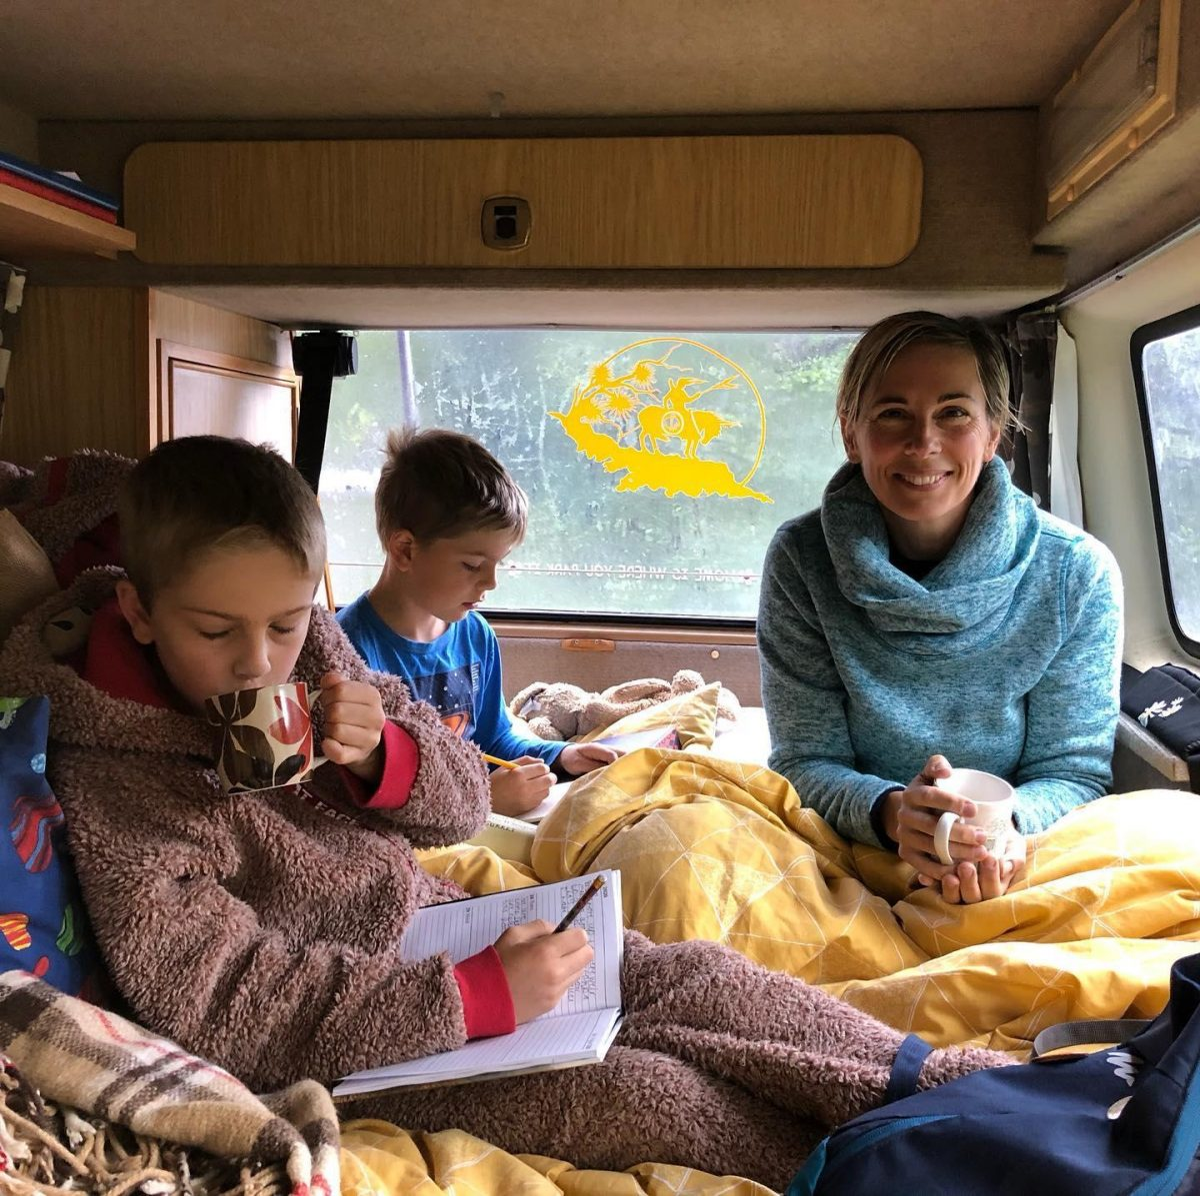 Scotland campervan Lazy mornings in the van Steven Hunt